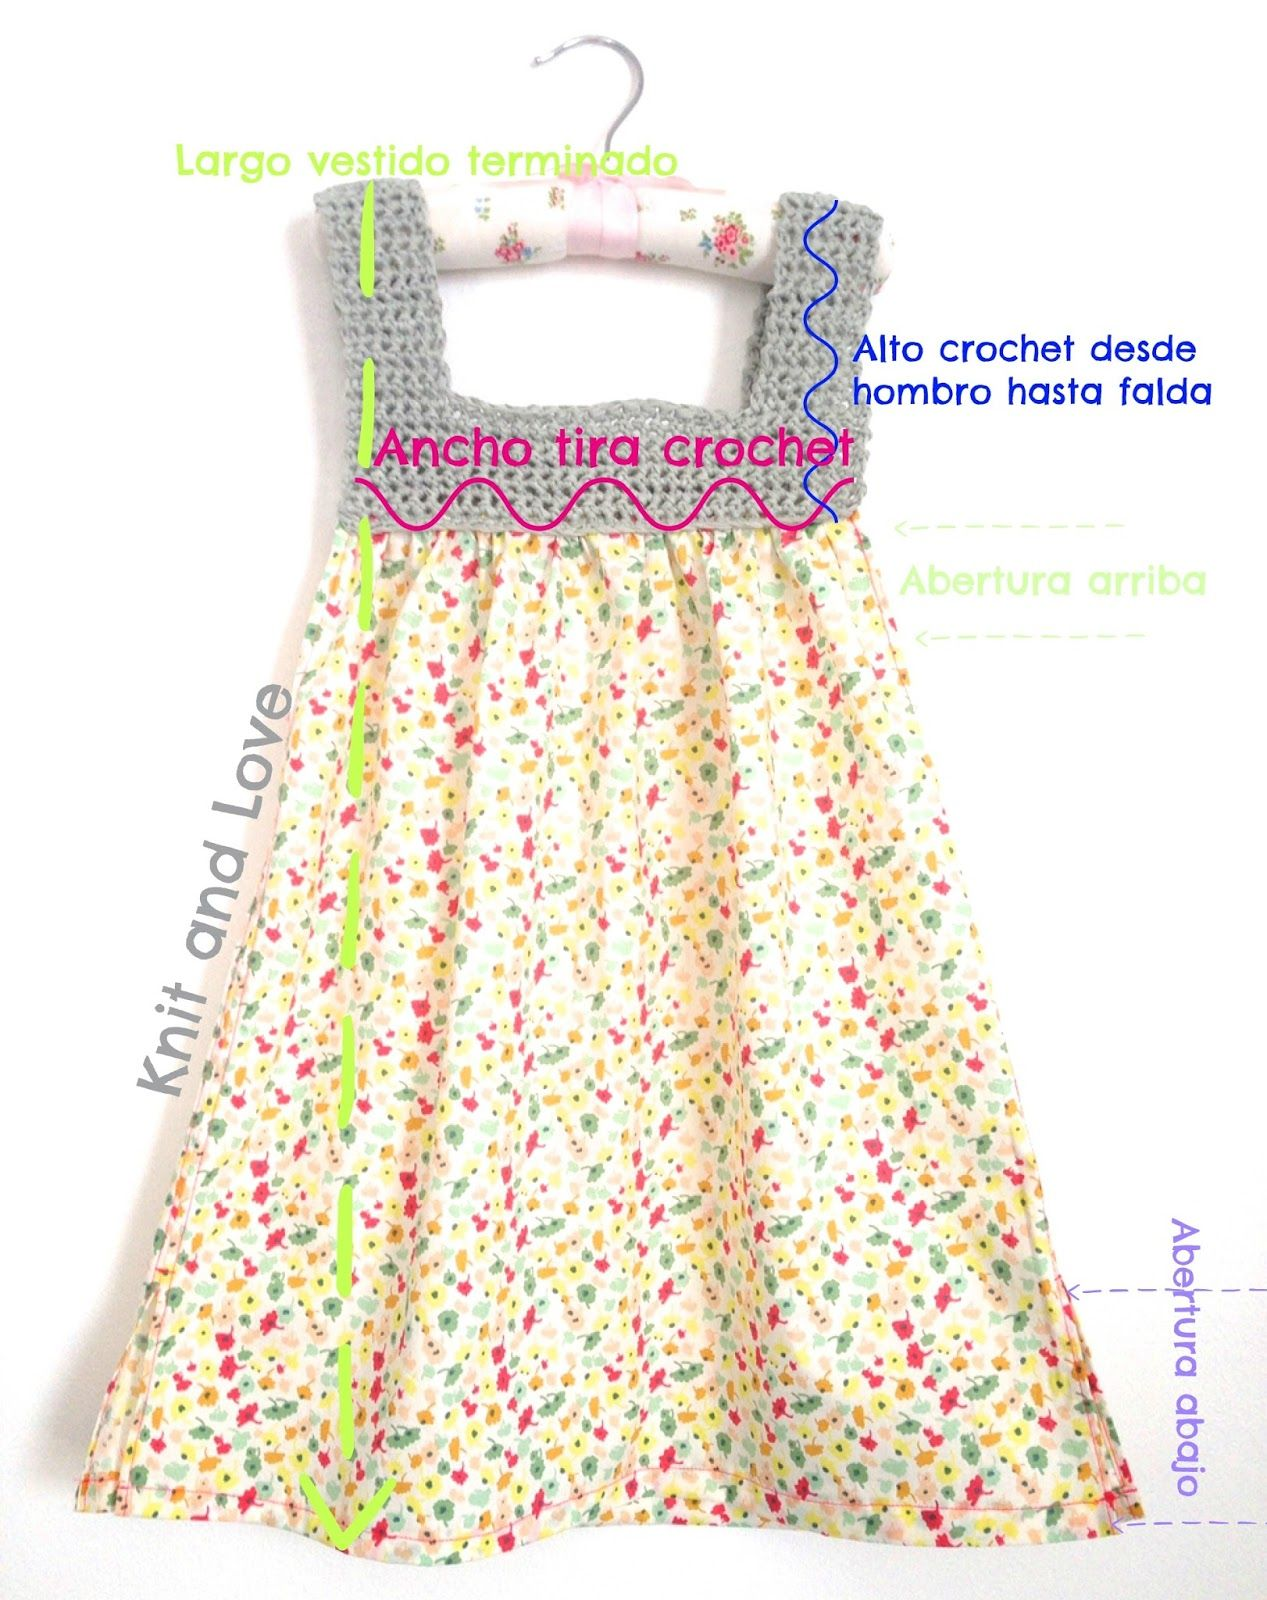 Pin by Chalibel M on Girly Crochet | Pinterest | Crochet, Knit ...